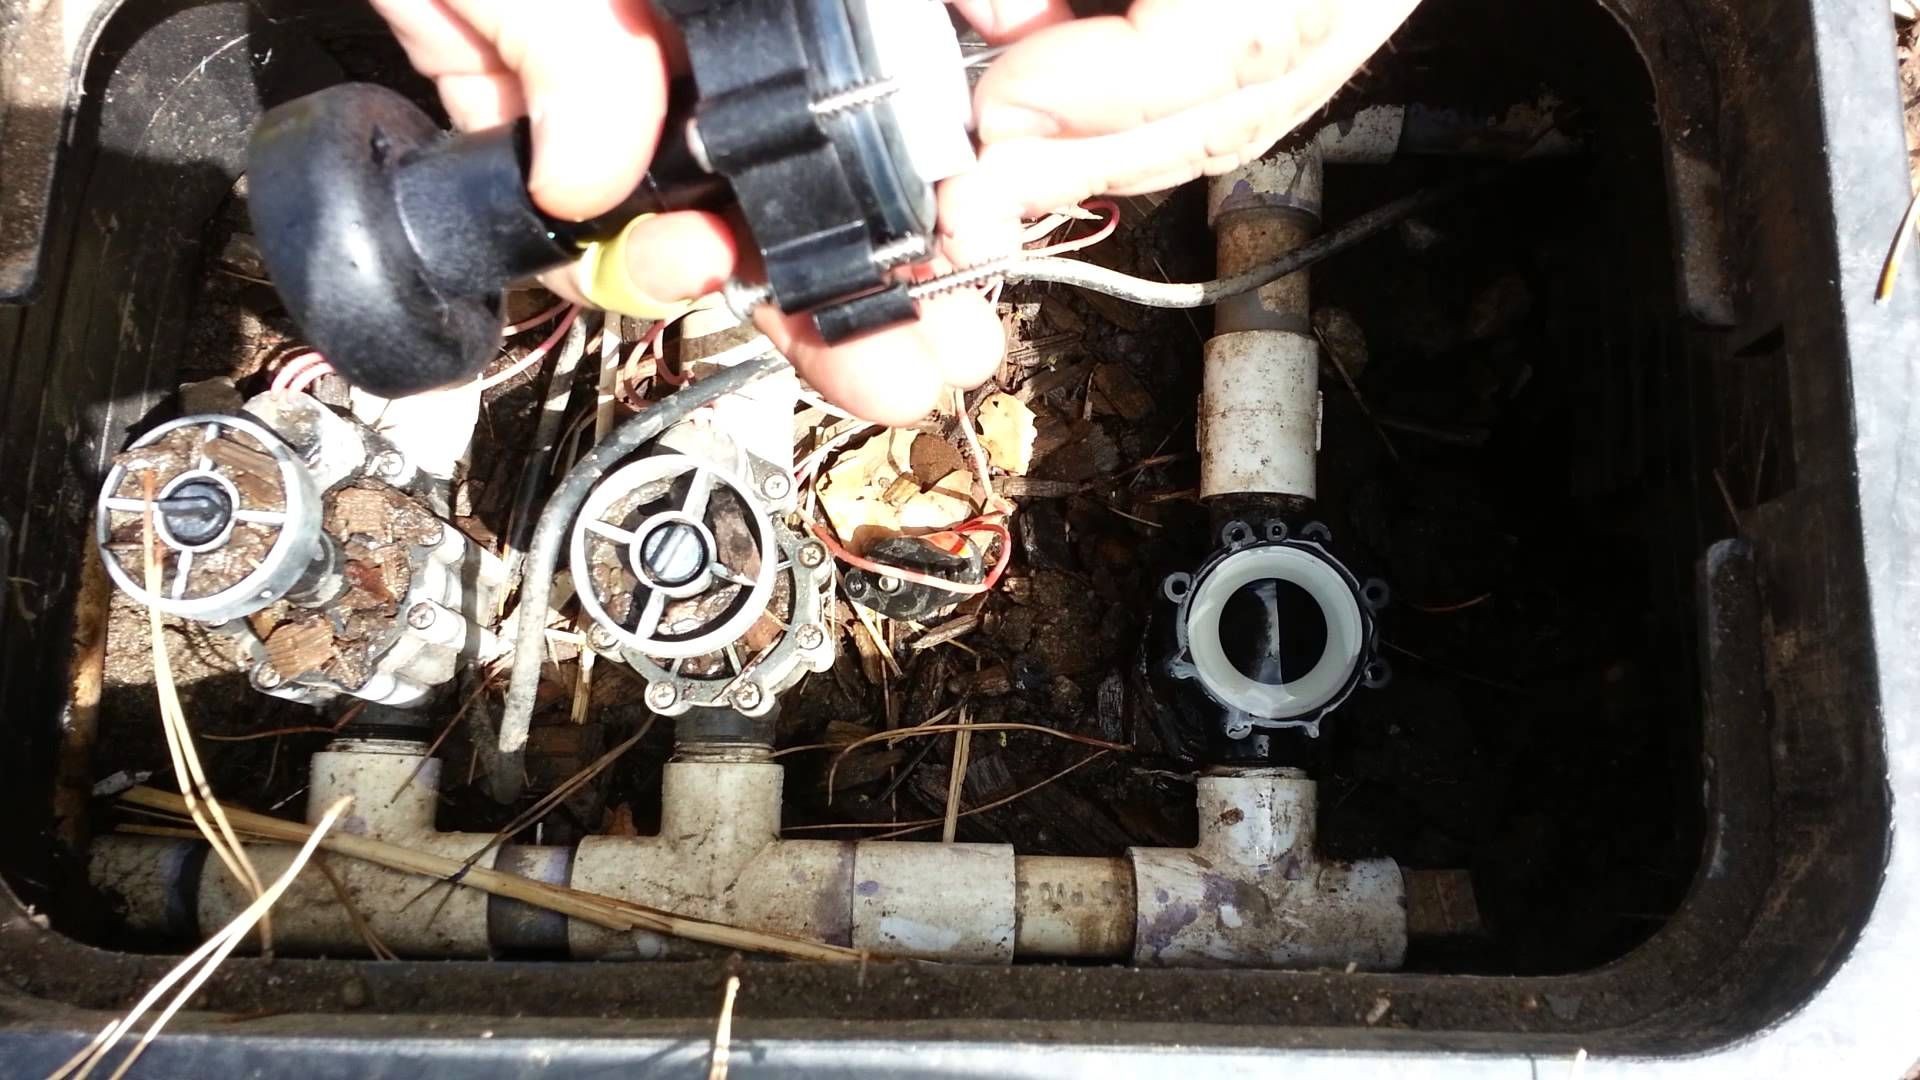 How to fix sprinkler valve that wont shut off sprinkler